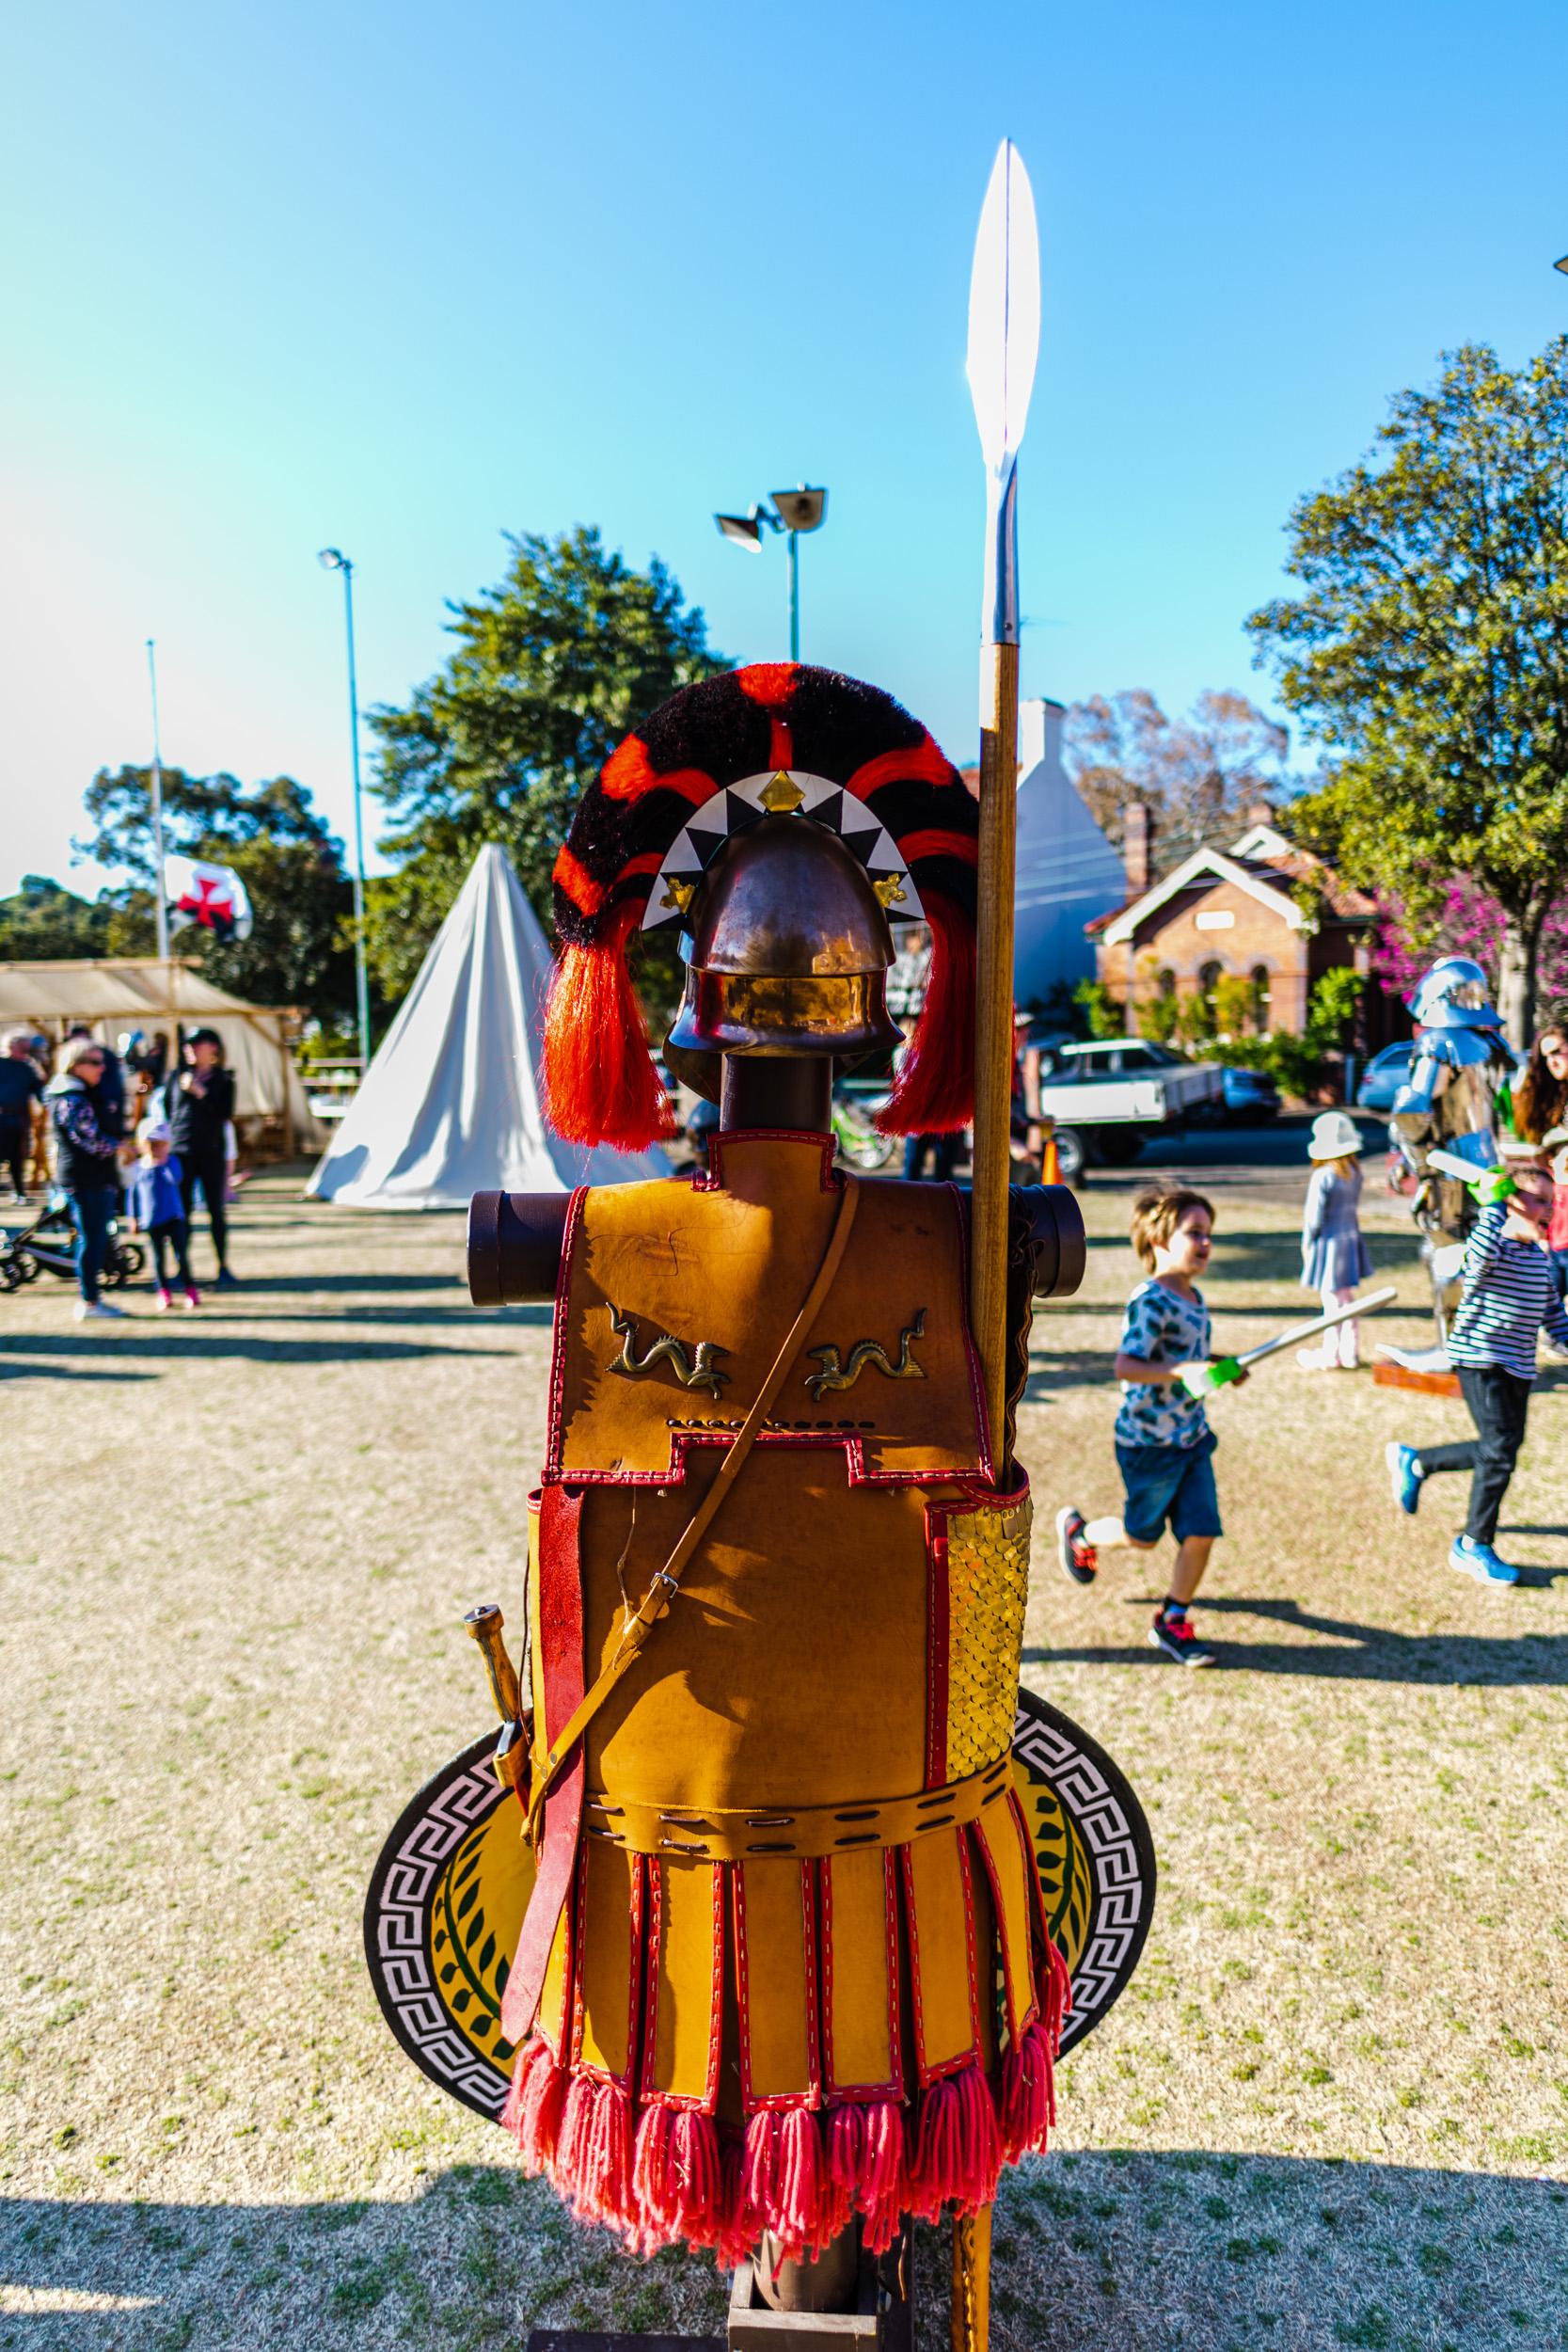 Spyrides_Kyle_Soul.Gazing.Photography_Medieval.Day_Reenactment.Group.Einherjar_Danelaw.Medieval.Fighting.Society_Petersham.Bowling.Club_18.8.2019DSC_0556.jpg